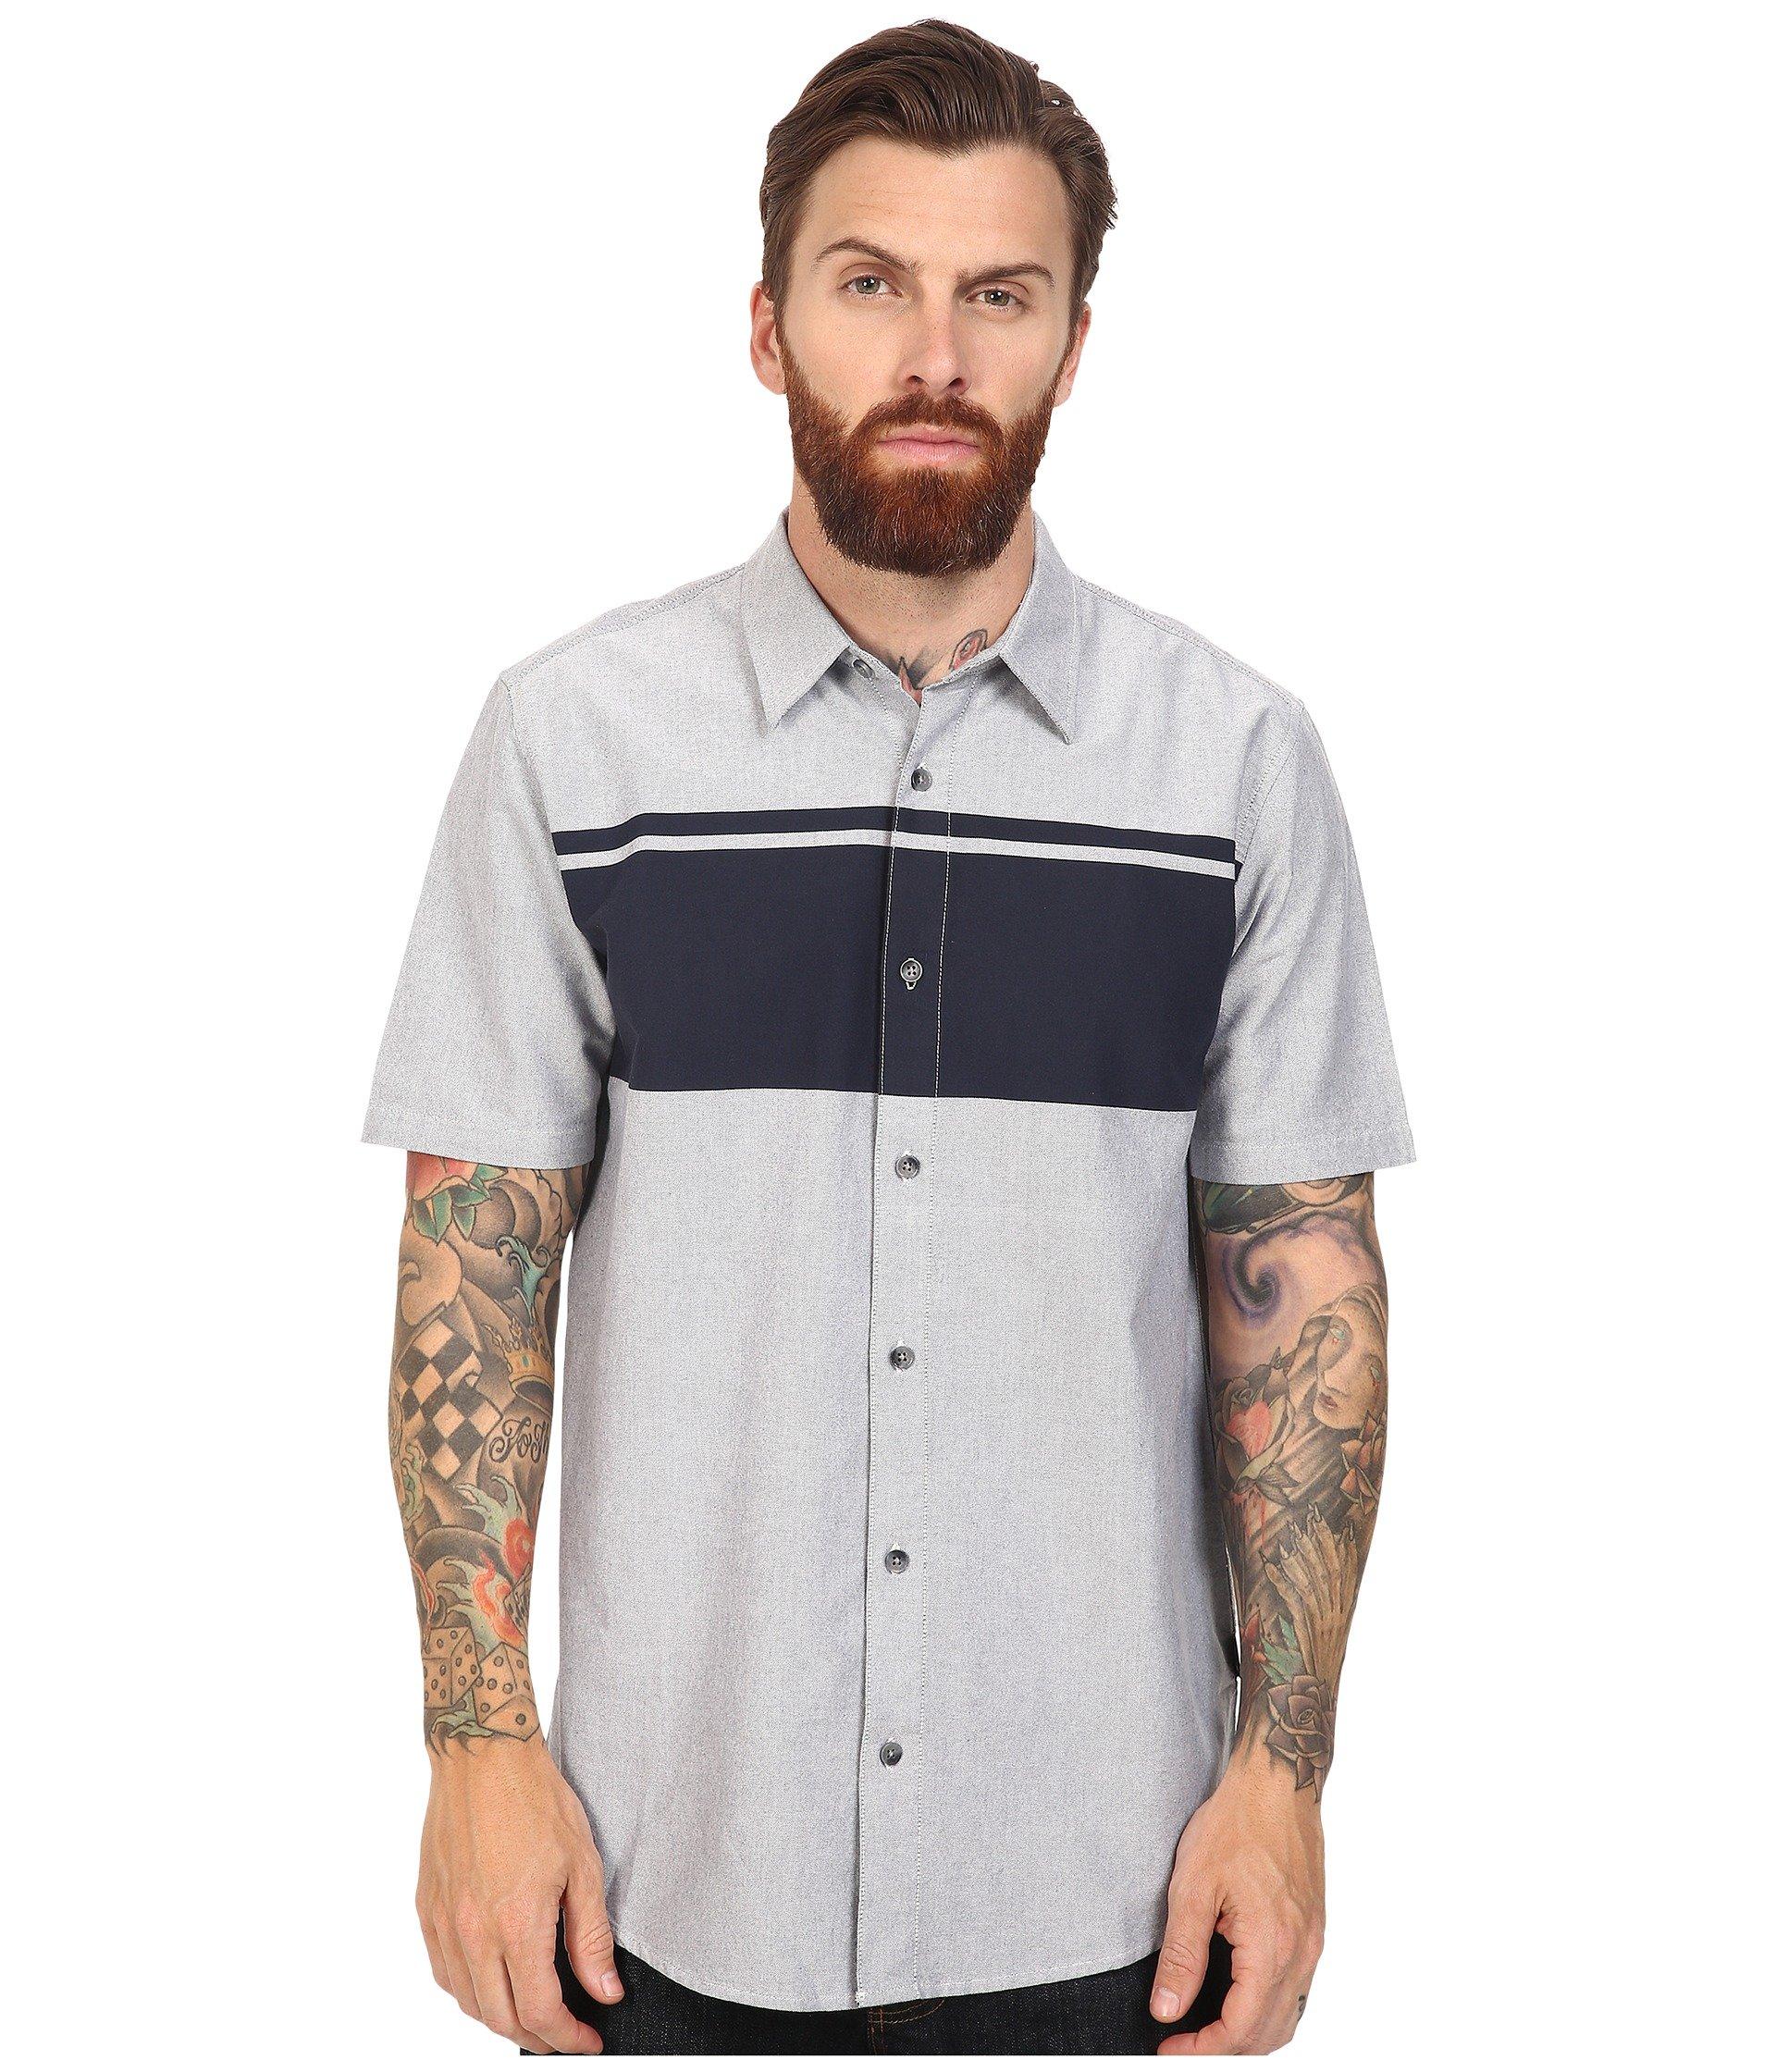 Camisa para Hombre Oakley Sims Woven Top  + Oakley en VeoyCompro.net